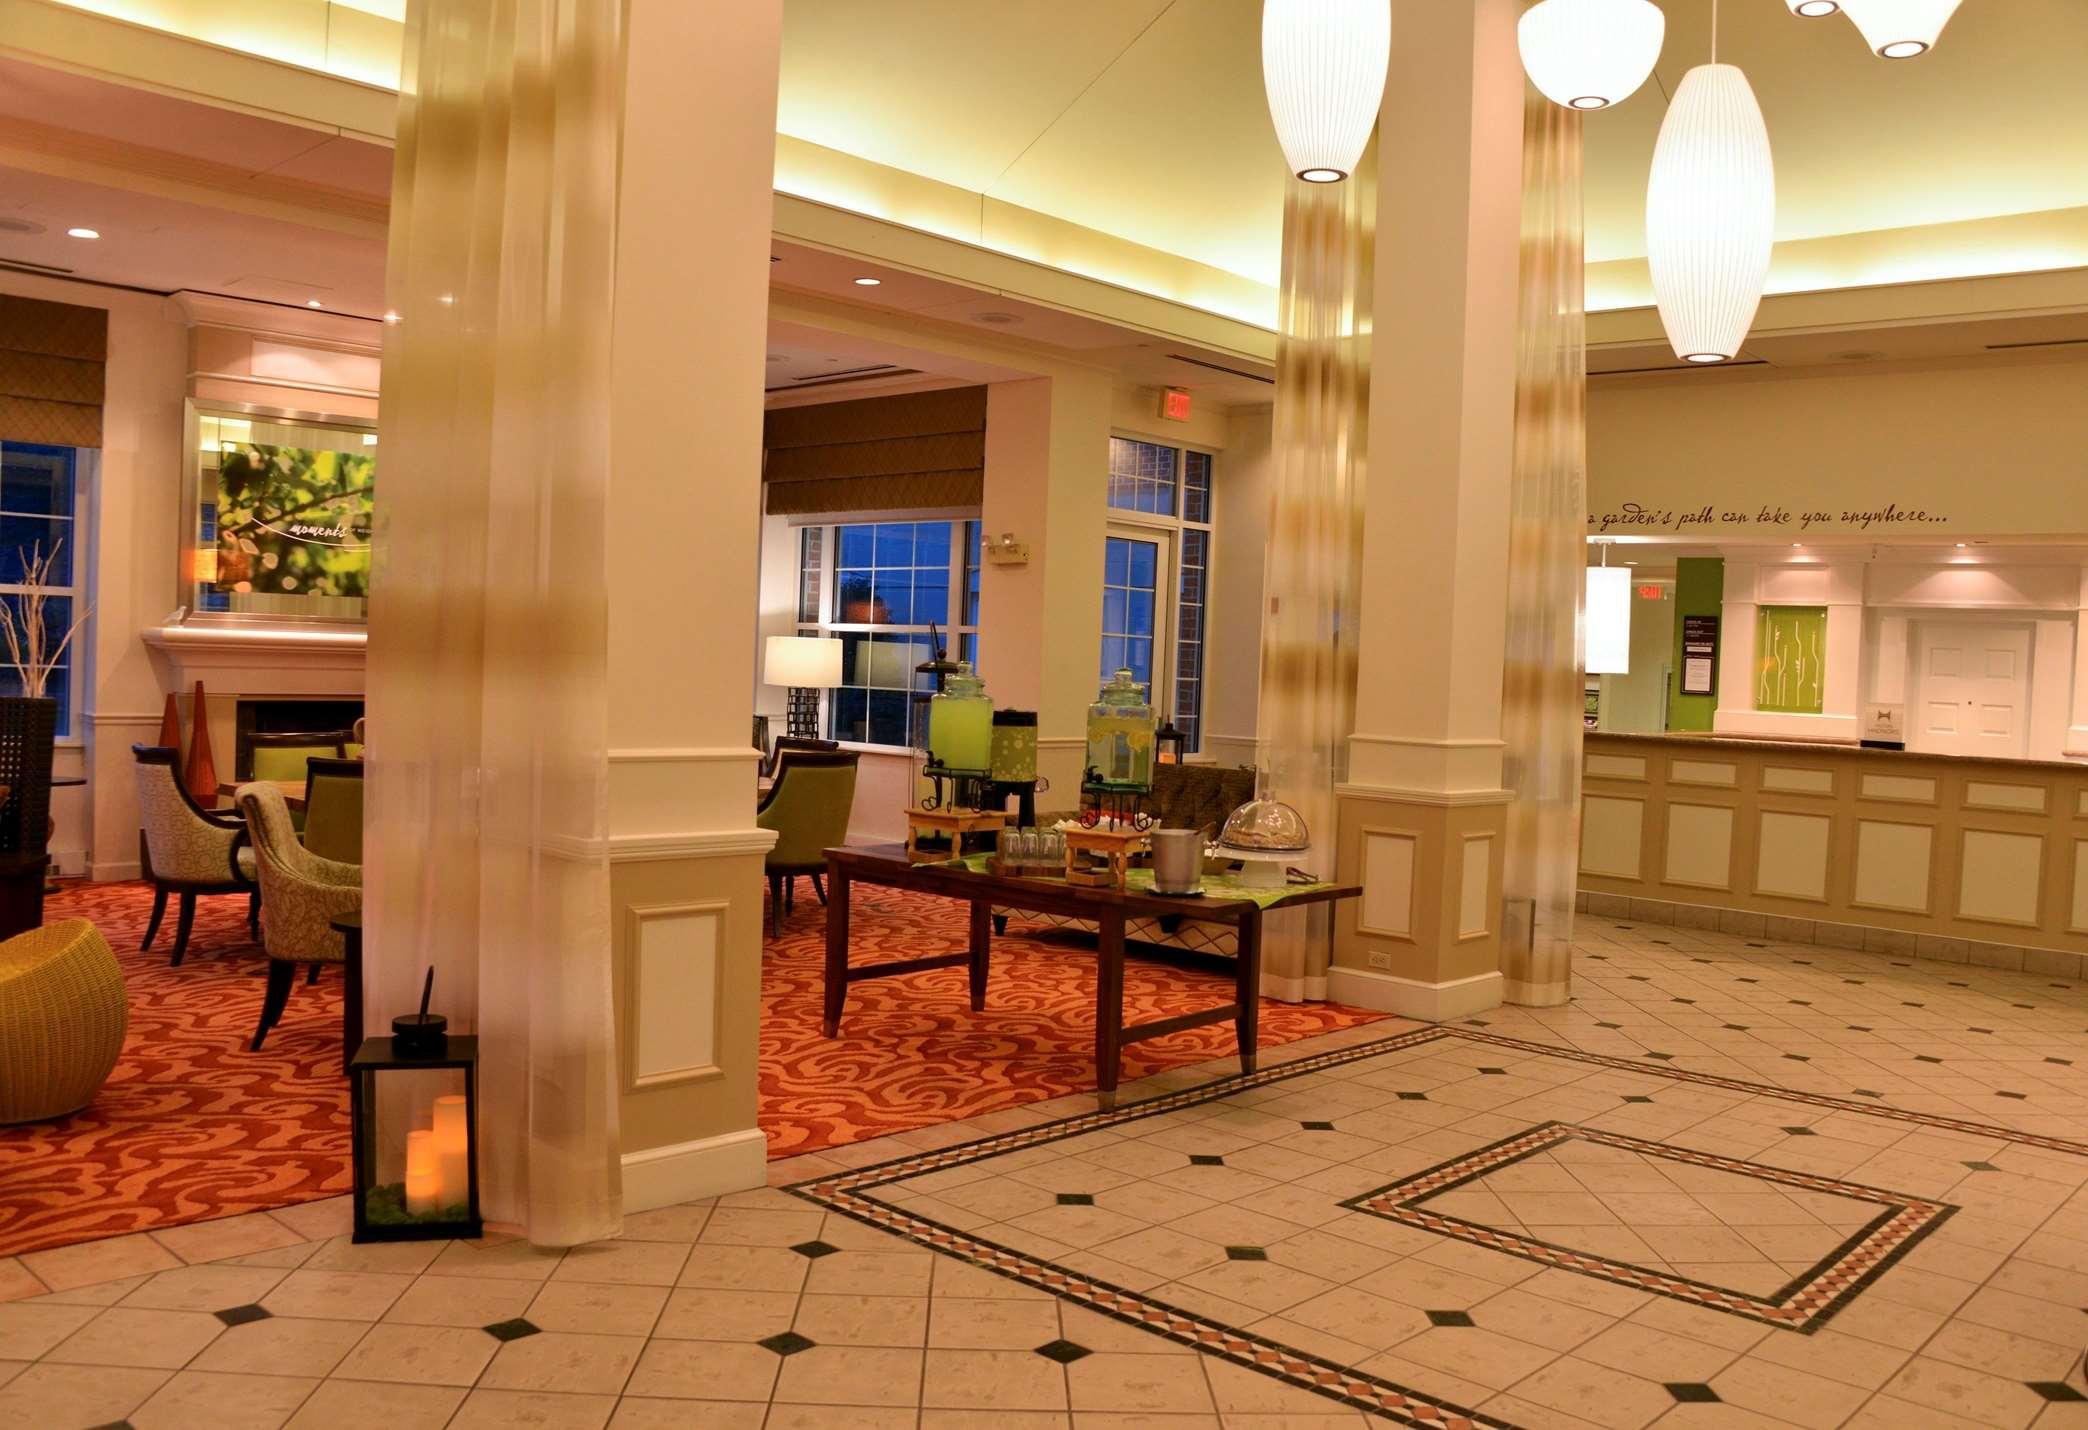 Hilton Garden Inn Williamsburg 1624 Richmond Road Williamsburg, VA ...